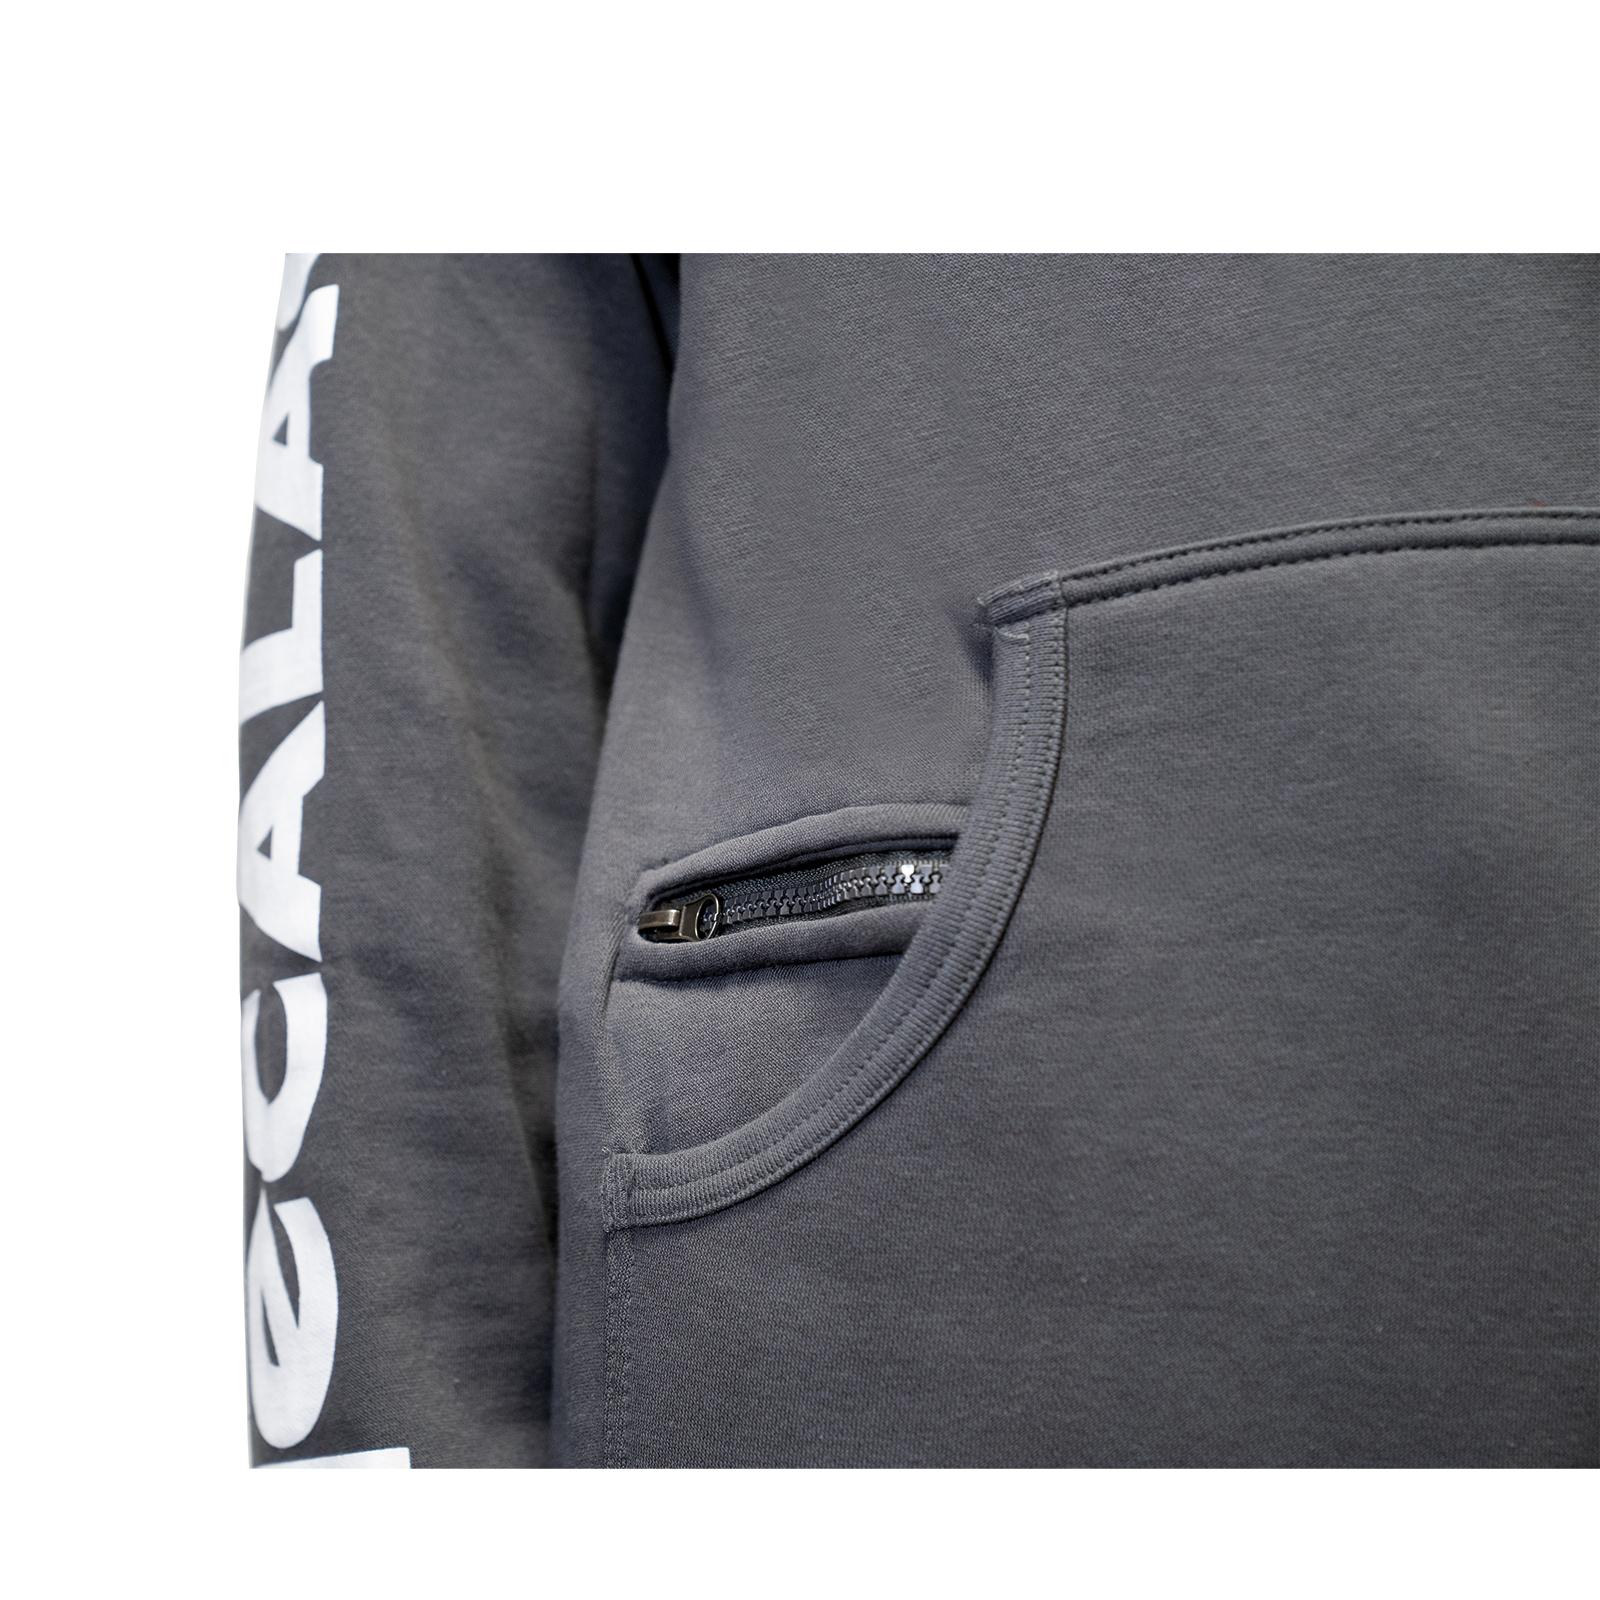 Hooded sweatshirt - grey